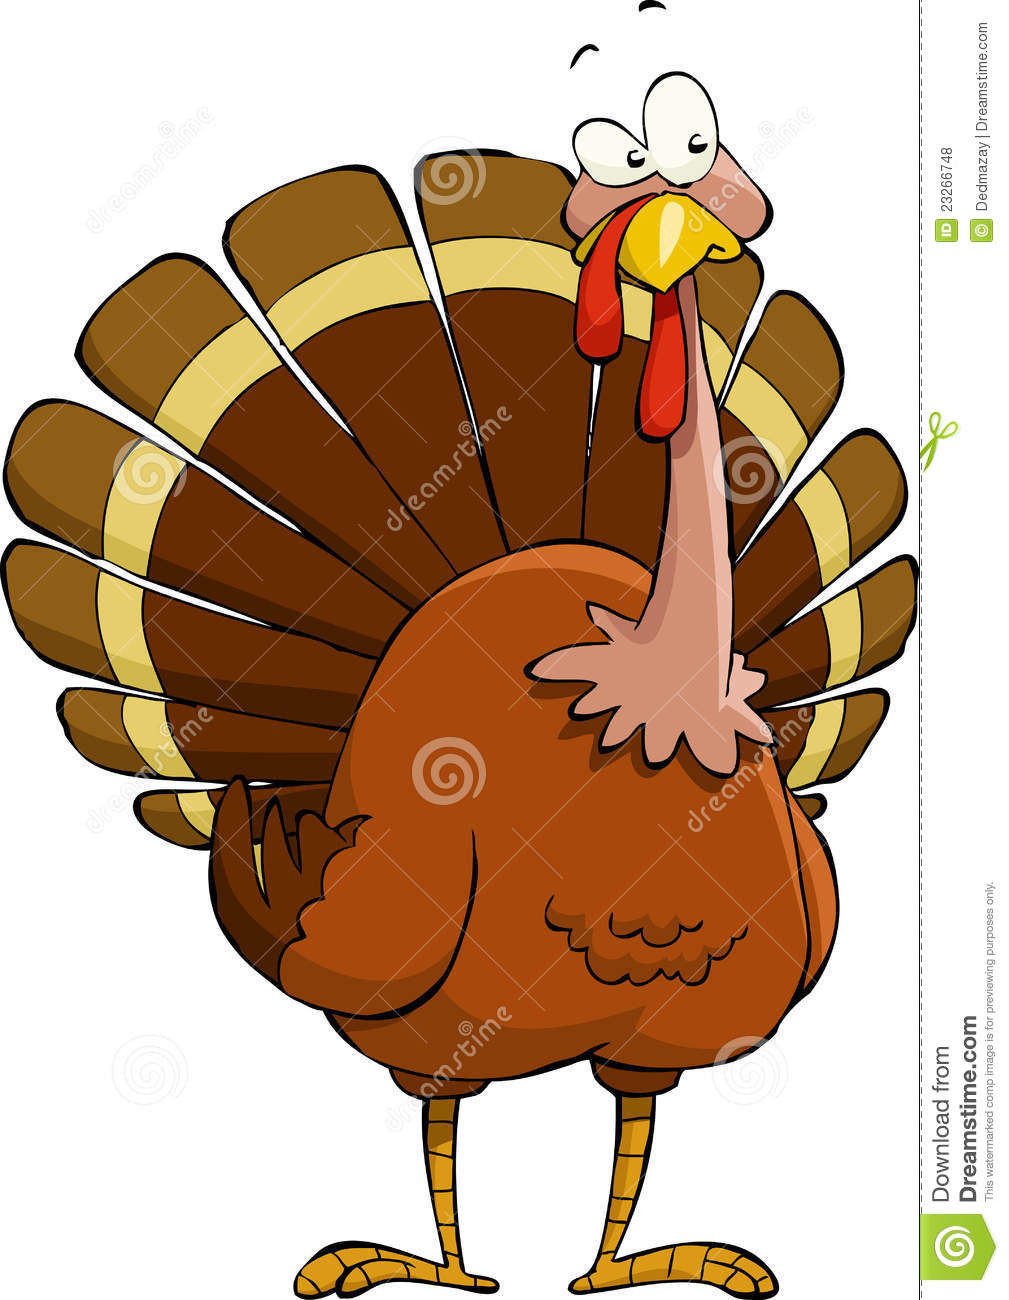 Cartoon Picture Of Turkey For Thanksgiving  Cartoon turkey stock vector Illustration of bird poultry